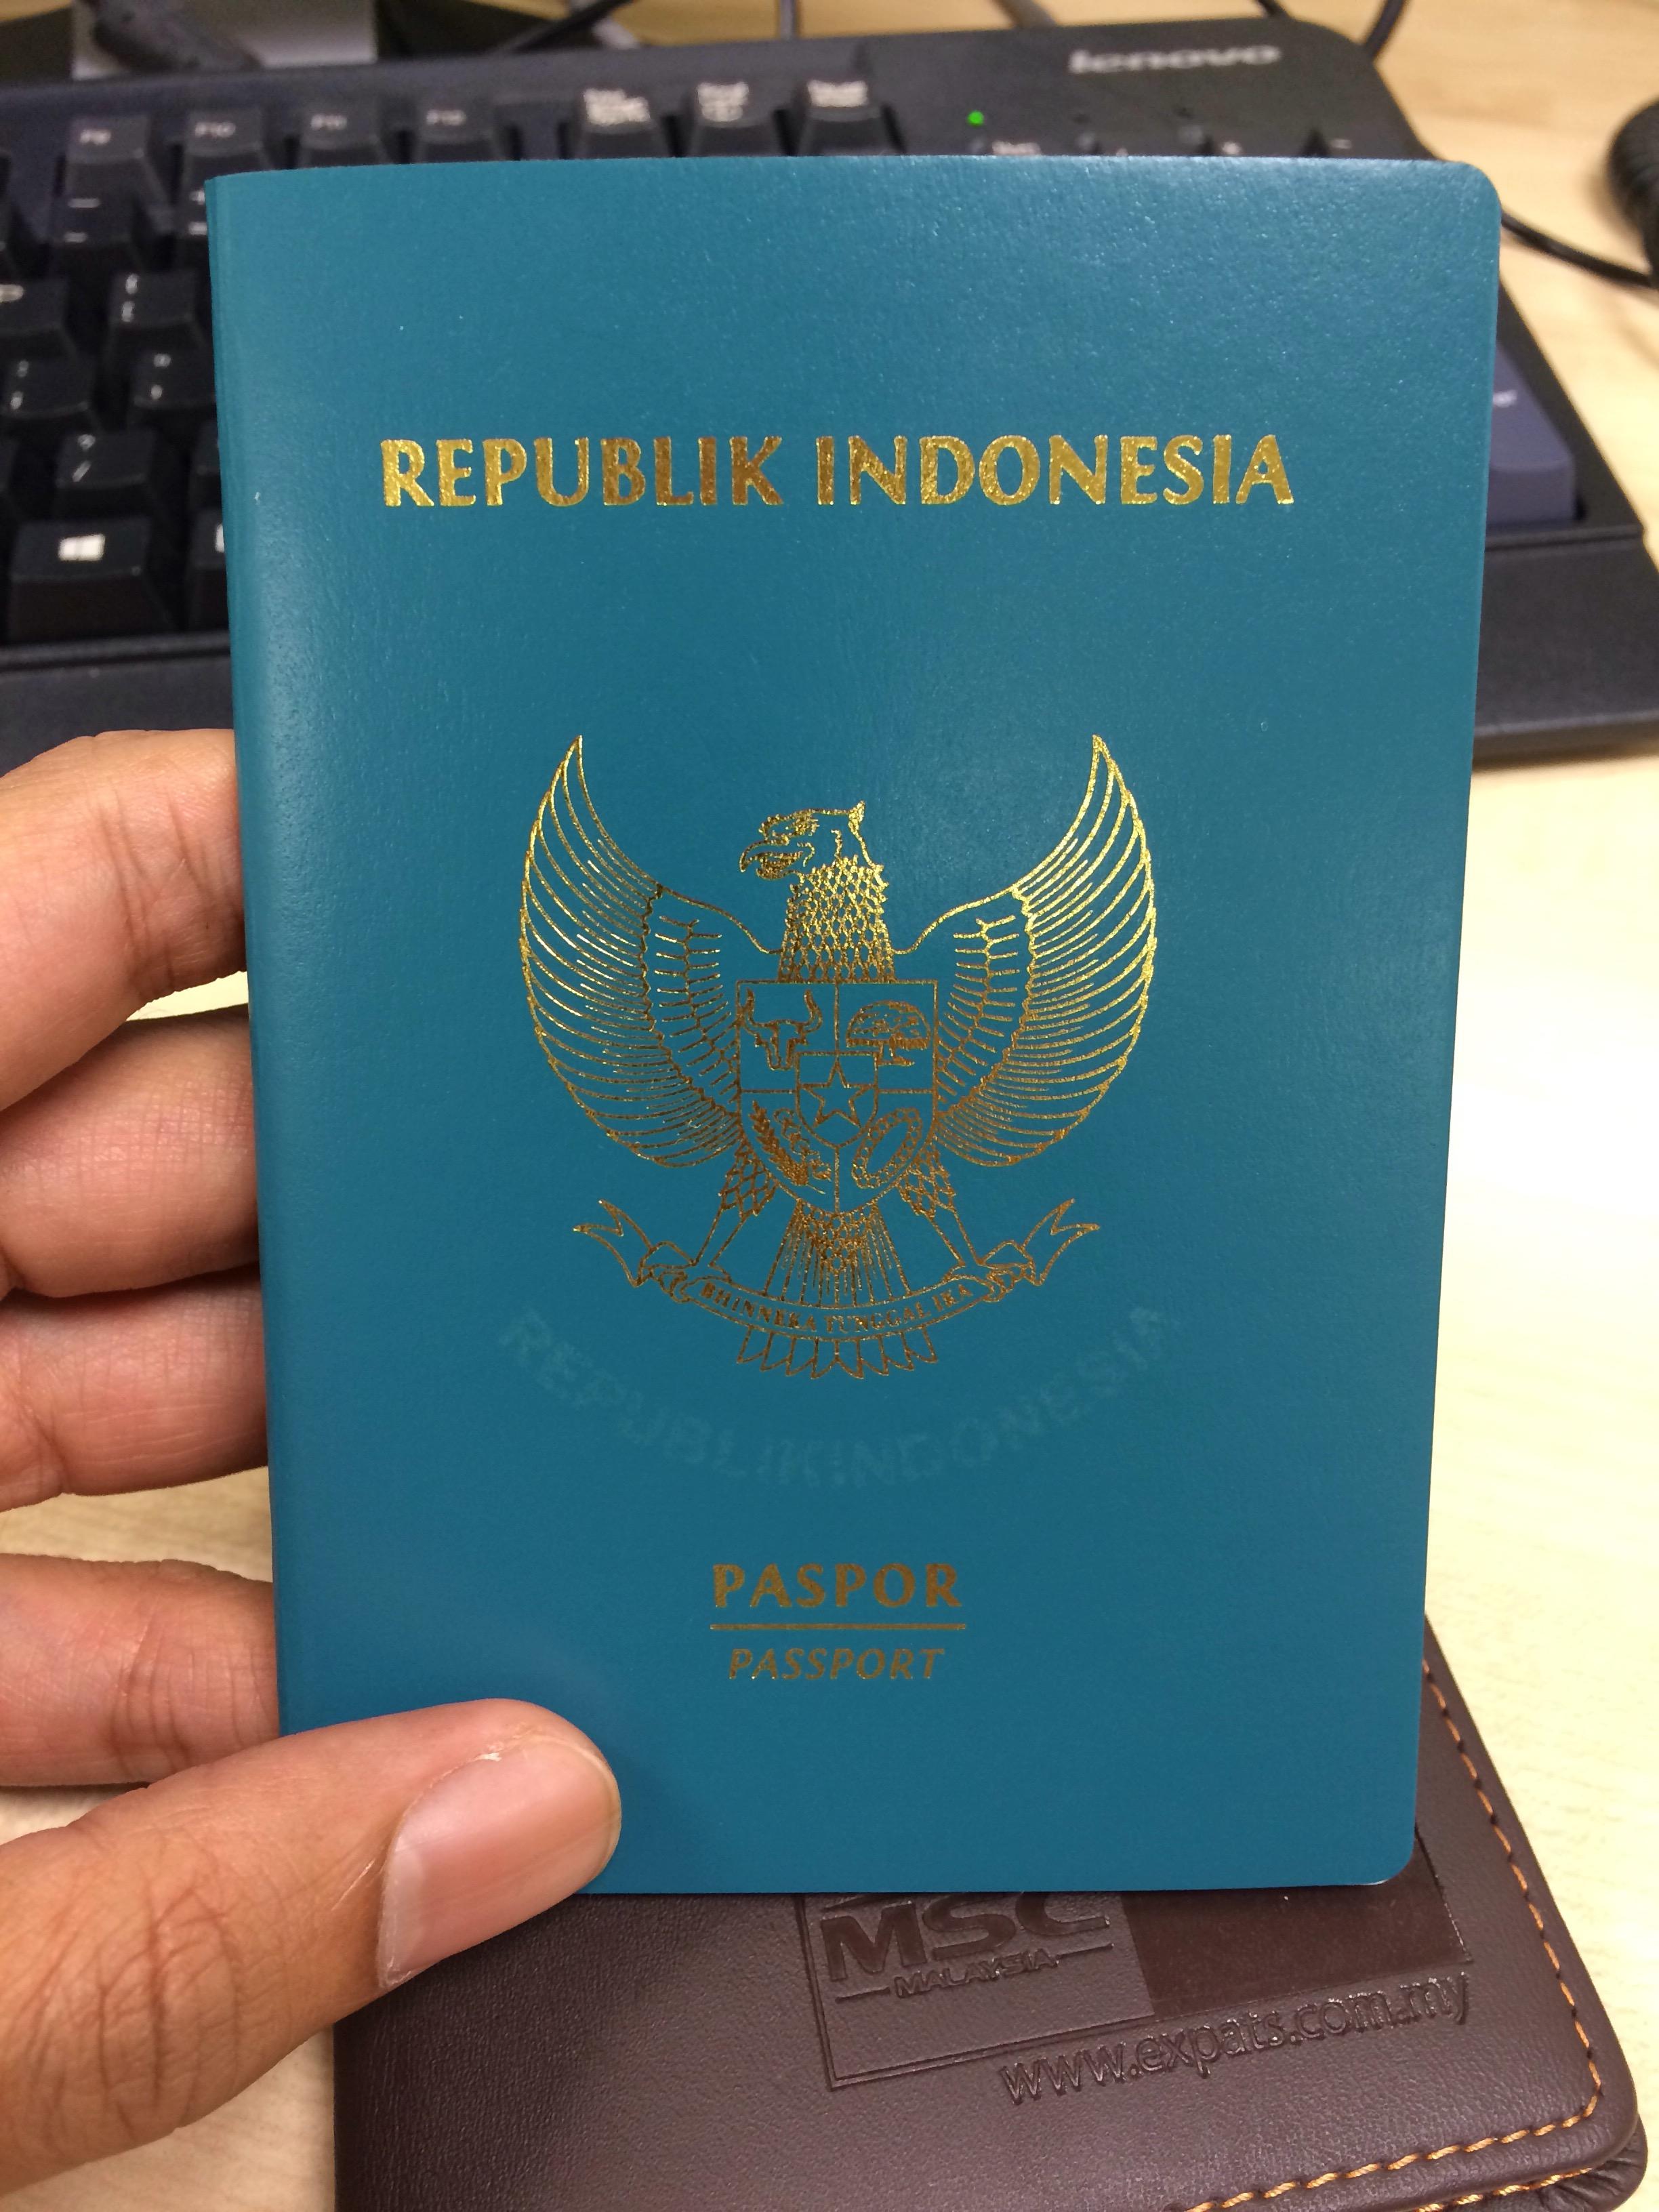 Perpanjang Paspor Di Kbri Kuala Lumpur Malaysia Another Random Keystrokes From Hendraptr